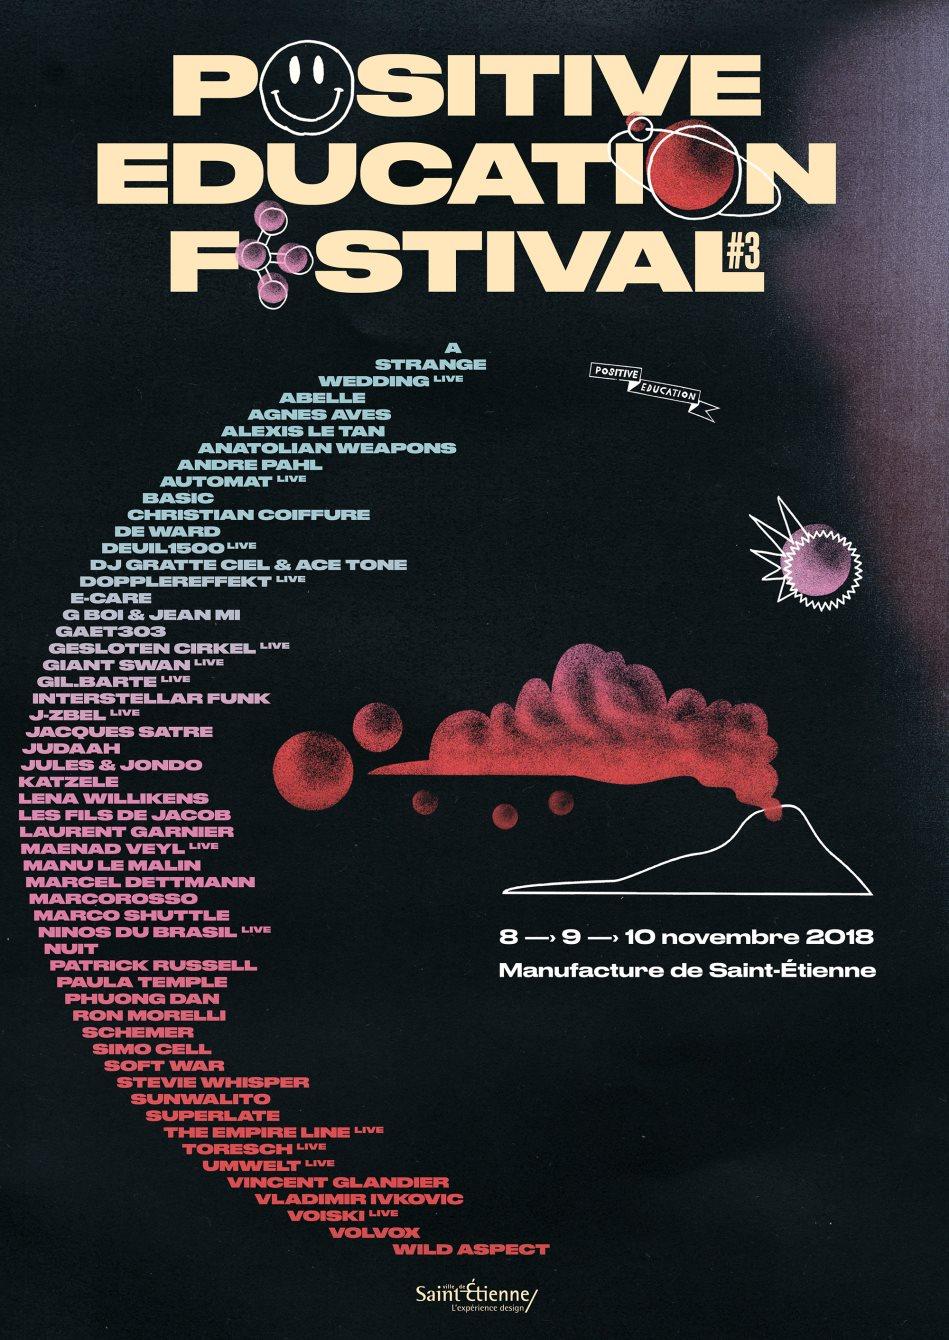 Positive Education Festival #3 - Flyer front